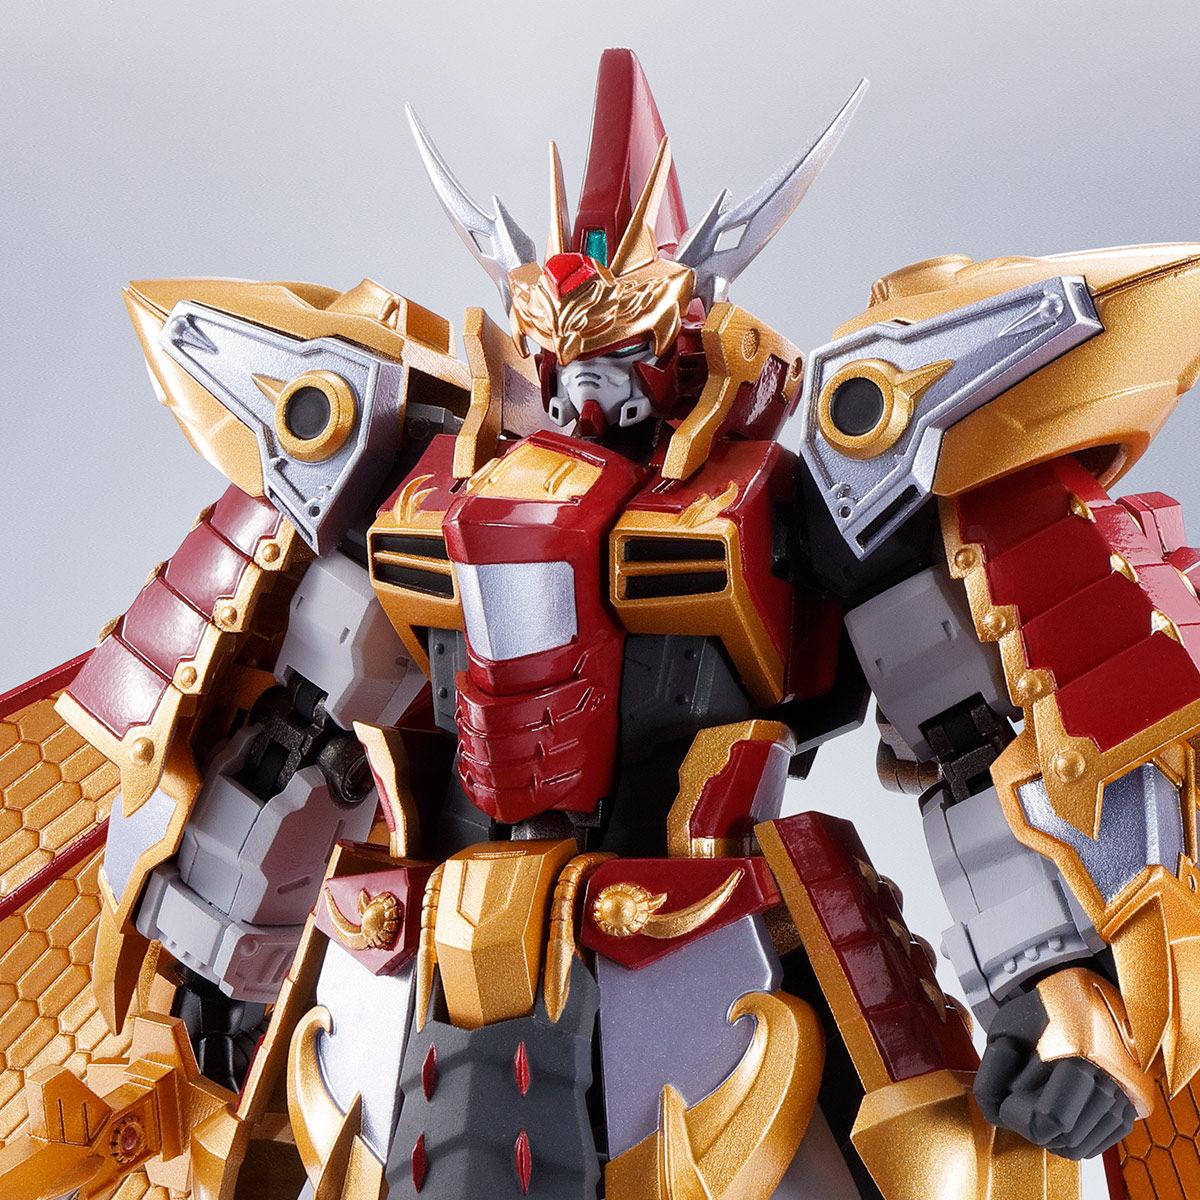 Bandai Metal Robot Spirits /<Side MS/> CaoCao Gundam Real Type Ver Action Figure